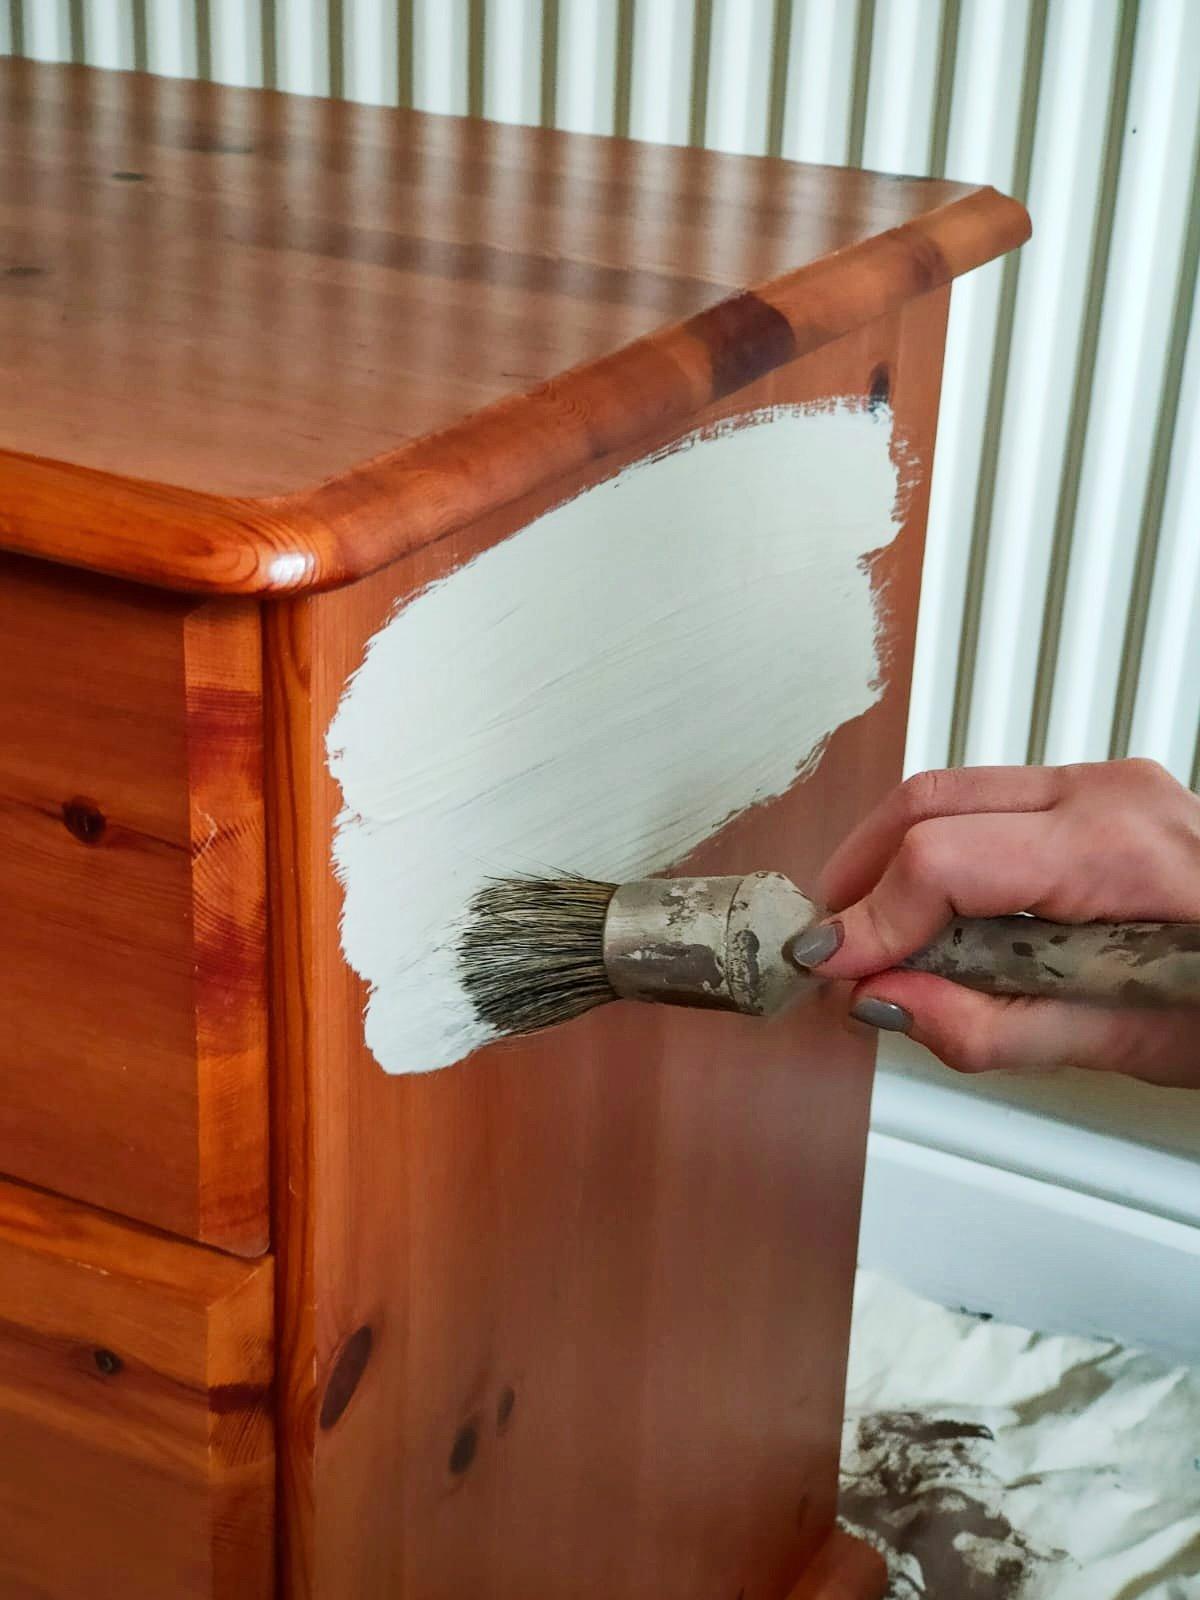 Paint brush begins on drawers